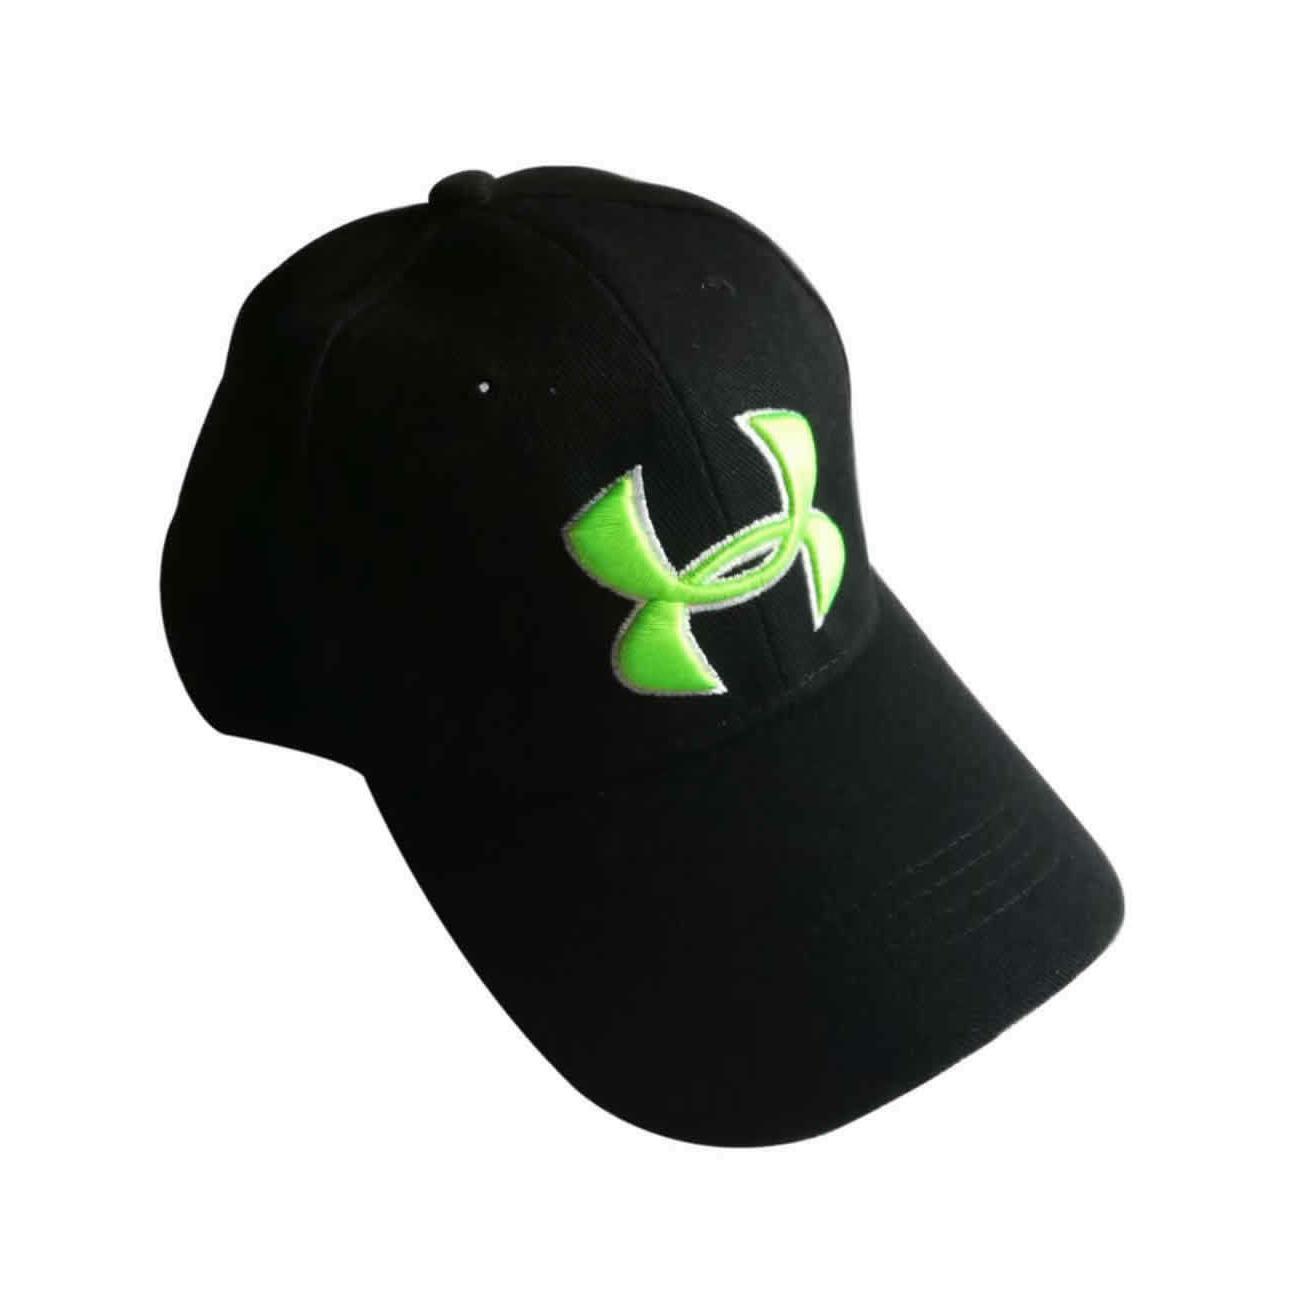 Adjustable Fit Under Armour Golf Unisex Women Men Hat